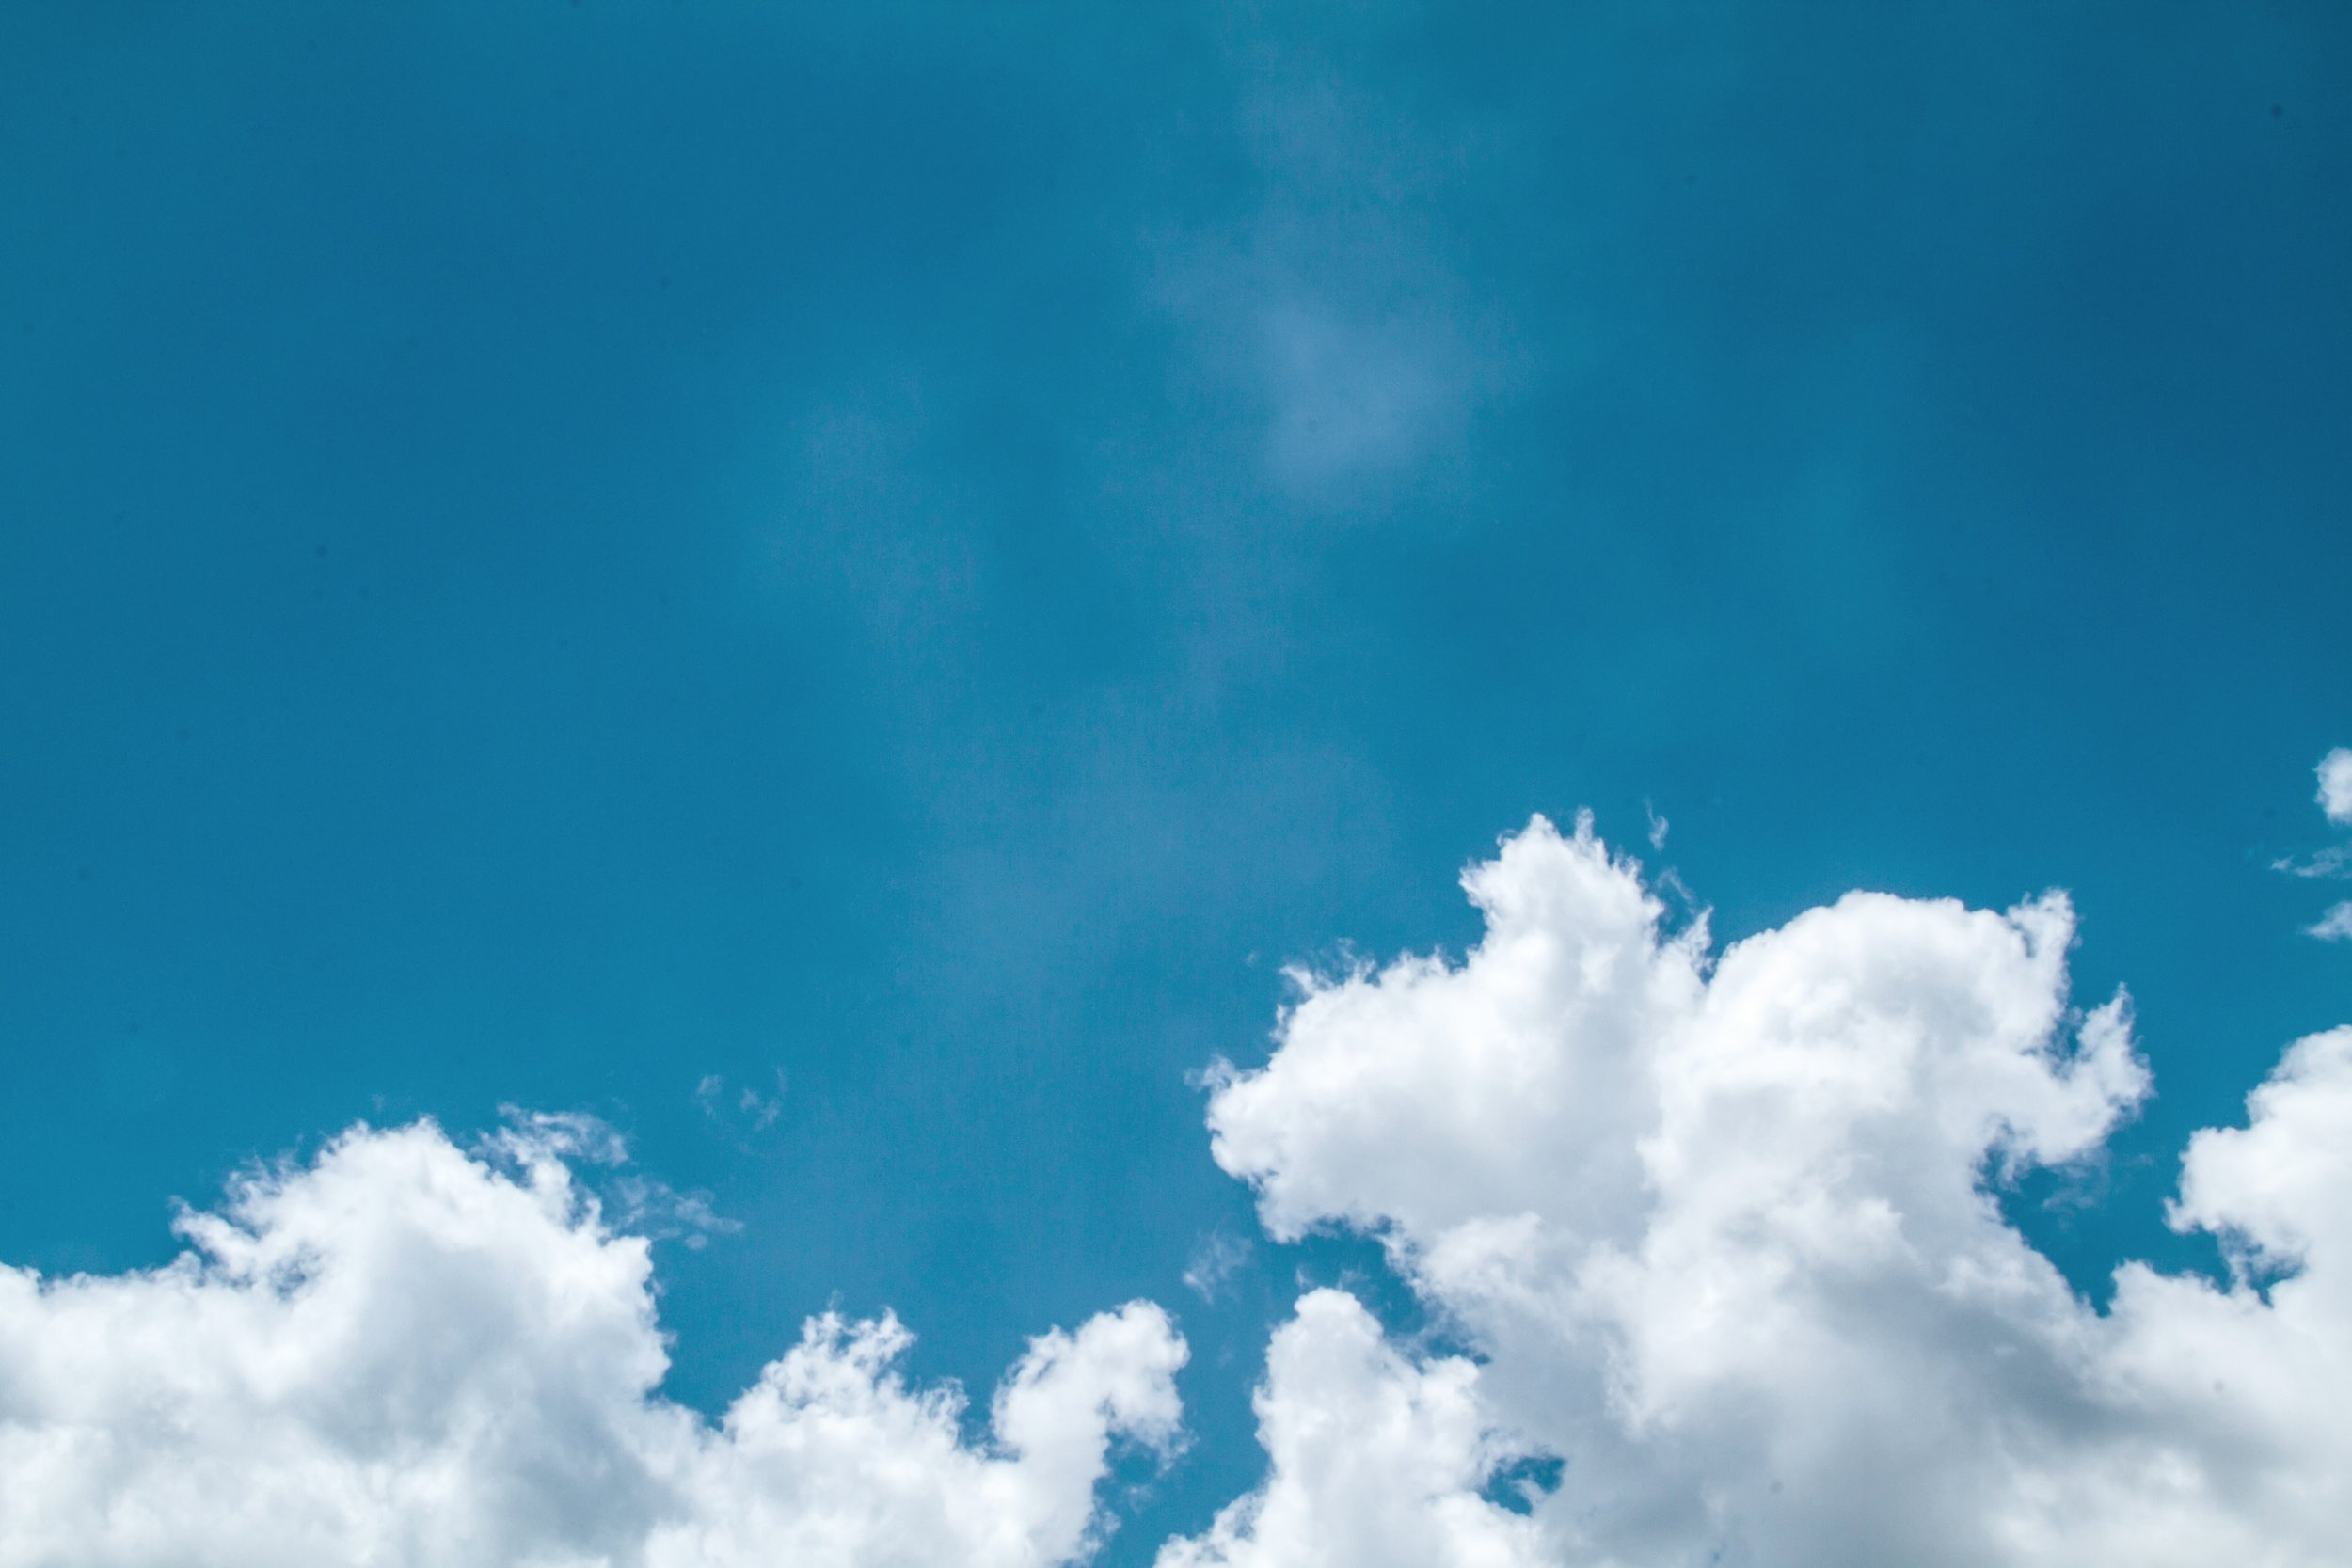 Medical ozone